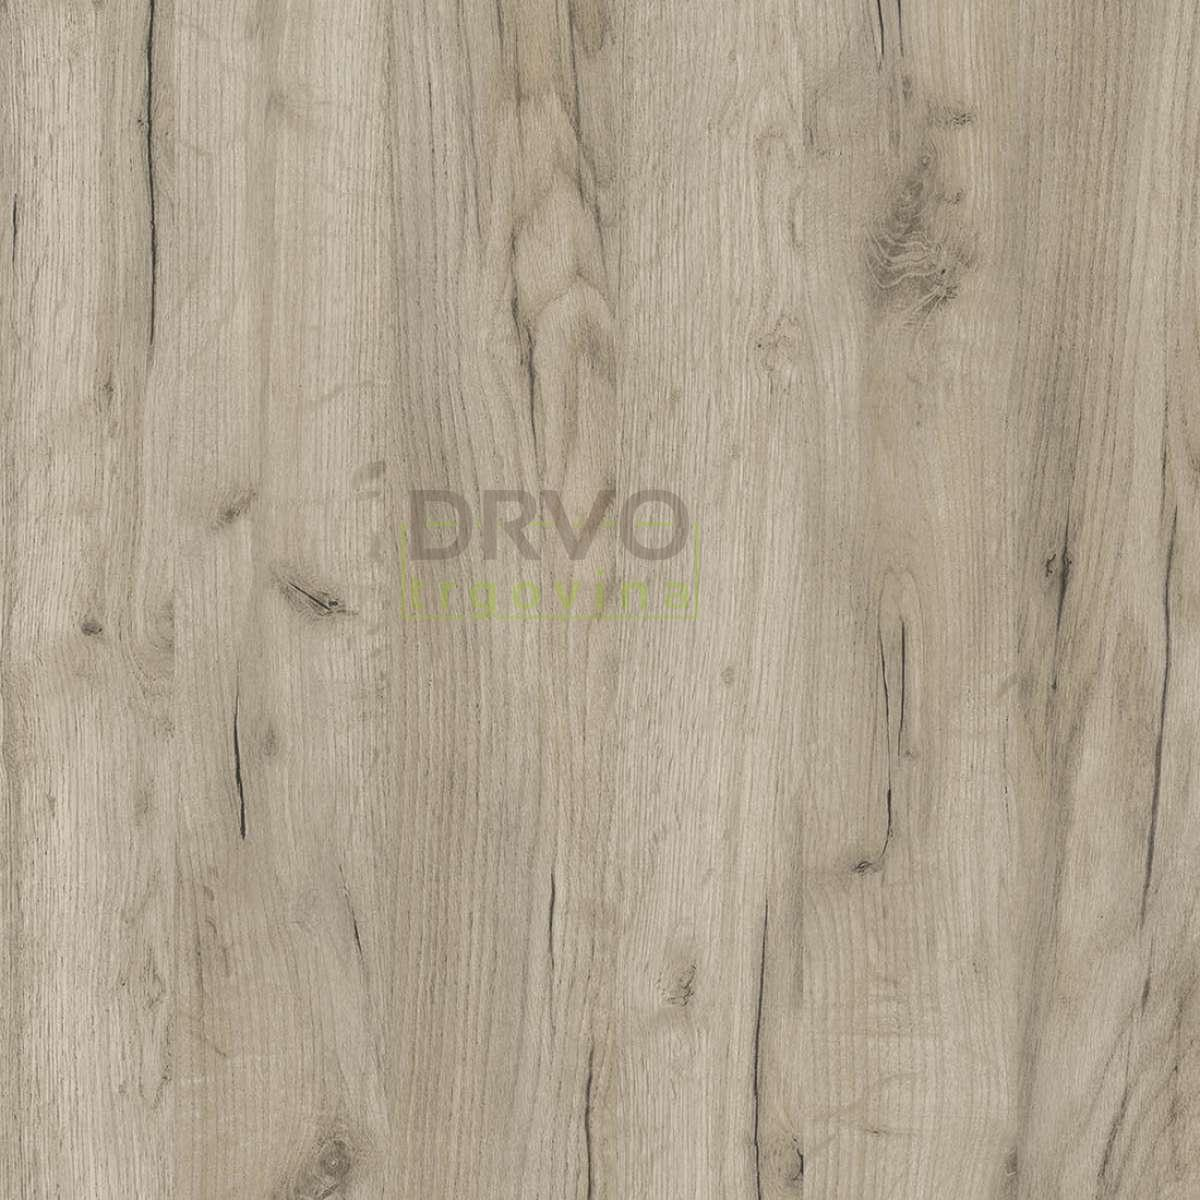 IVERICA OPLEMENJENA K002x HRAST GREY CRAFT 25mm 2800/2070